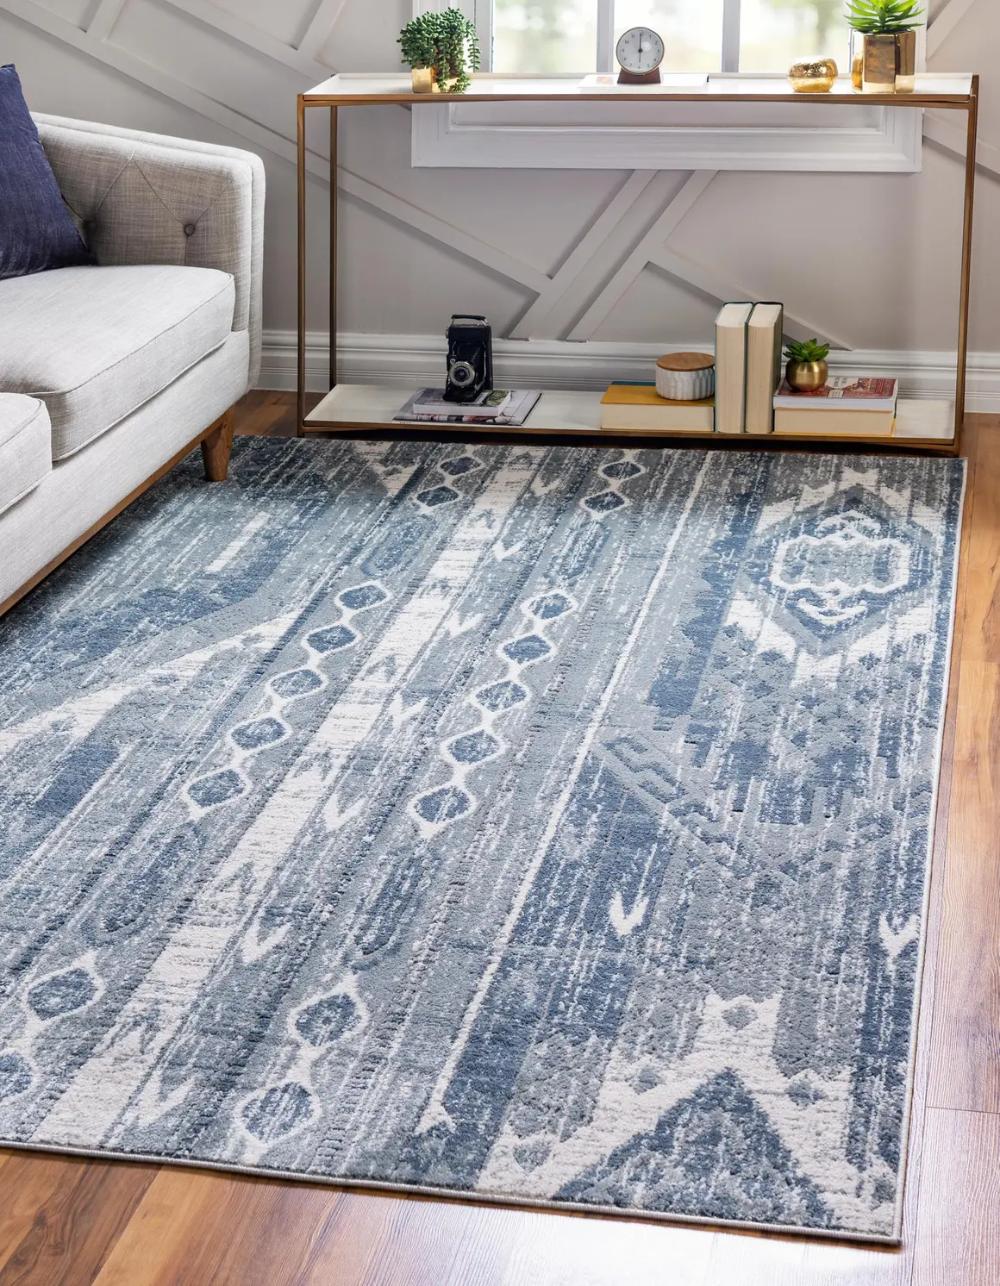 Blue Gray 6 X 9 Oregon Rug Esalerugs In 2020 Unique Loom Round Rug Living Room Area Rugs